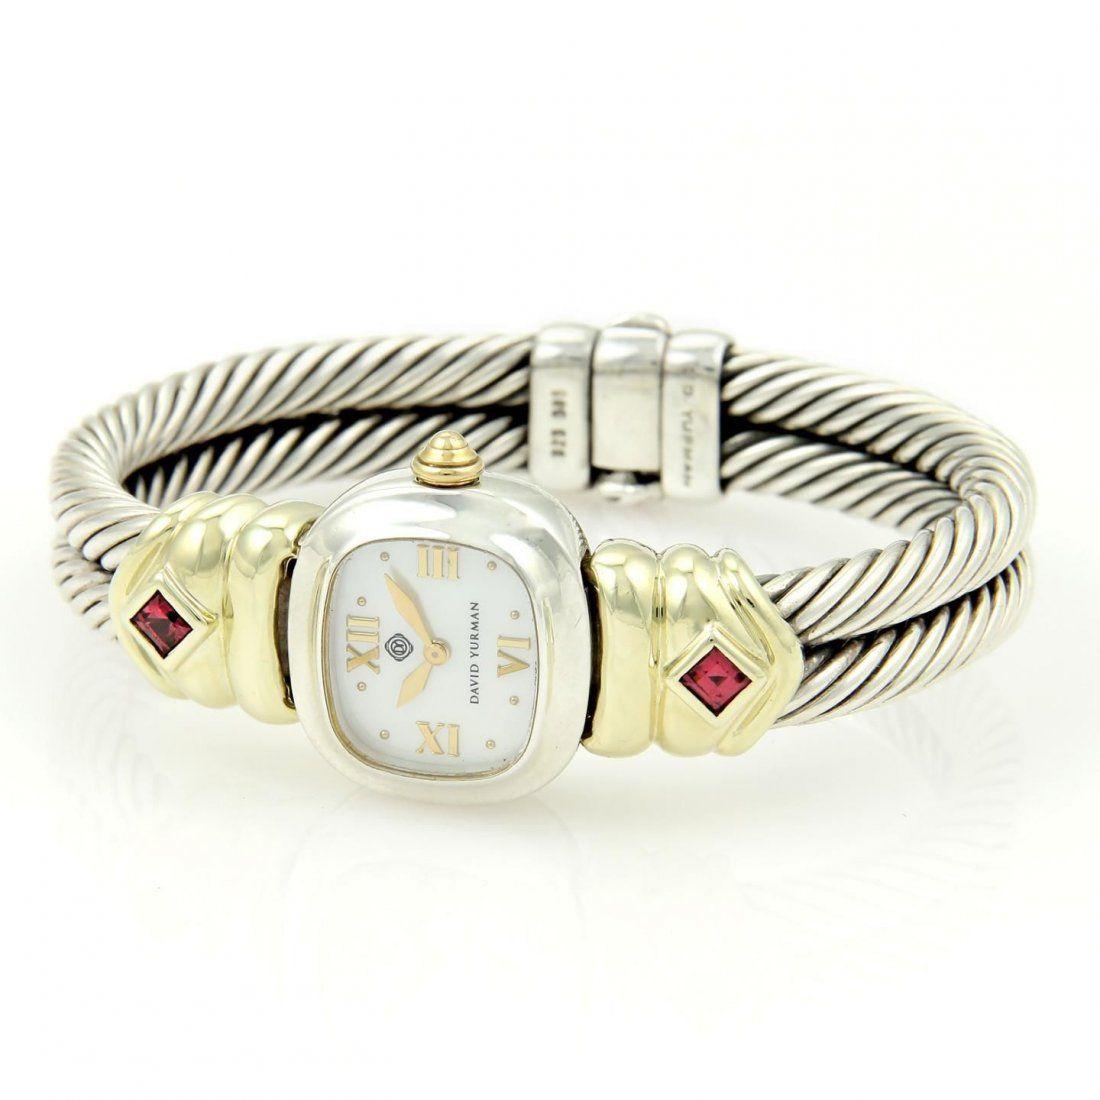 David Yurman Chelsea 925 Silver 14k Gold Pink